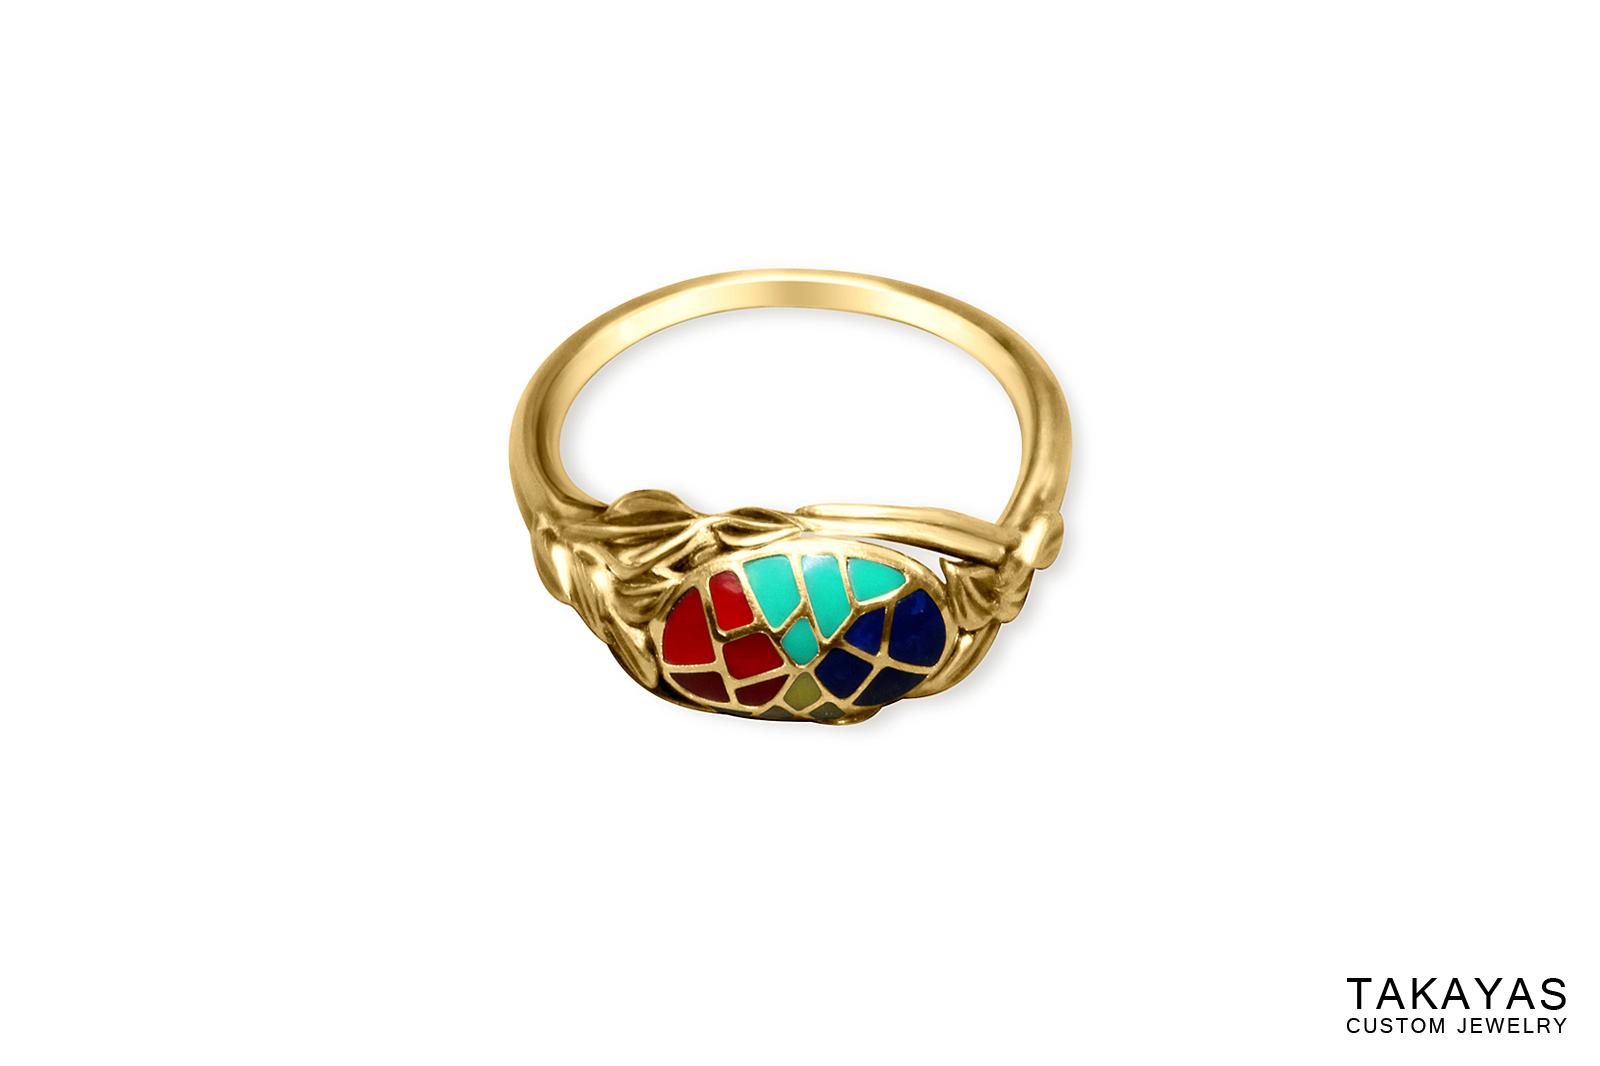 Enamel-Paris-Opera-House-Engagement-Ring-Takayas-Custom-Jewelry.jpg